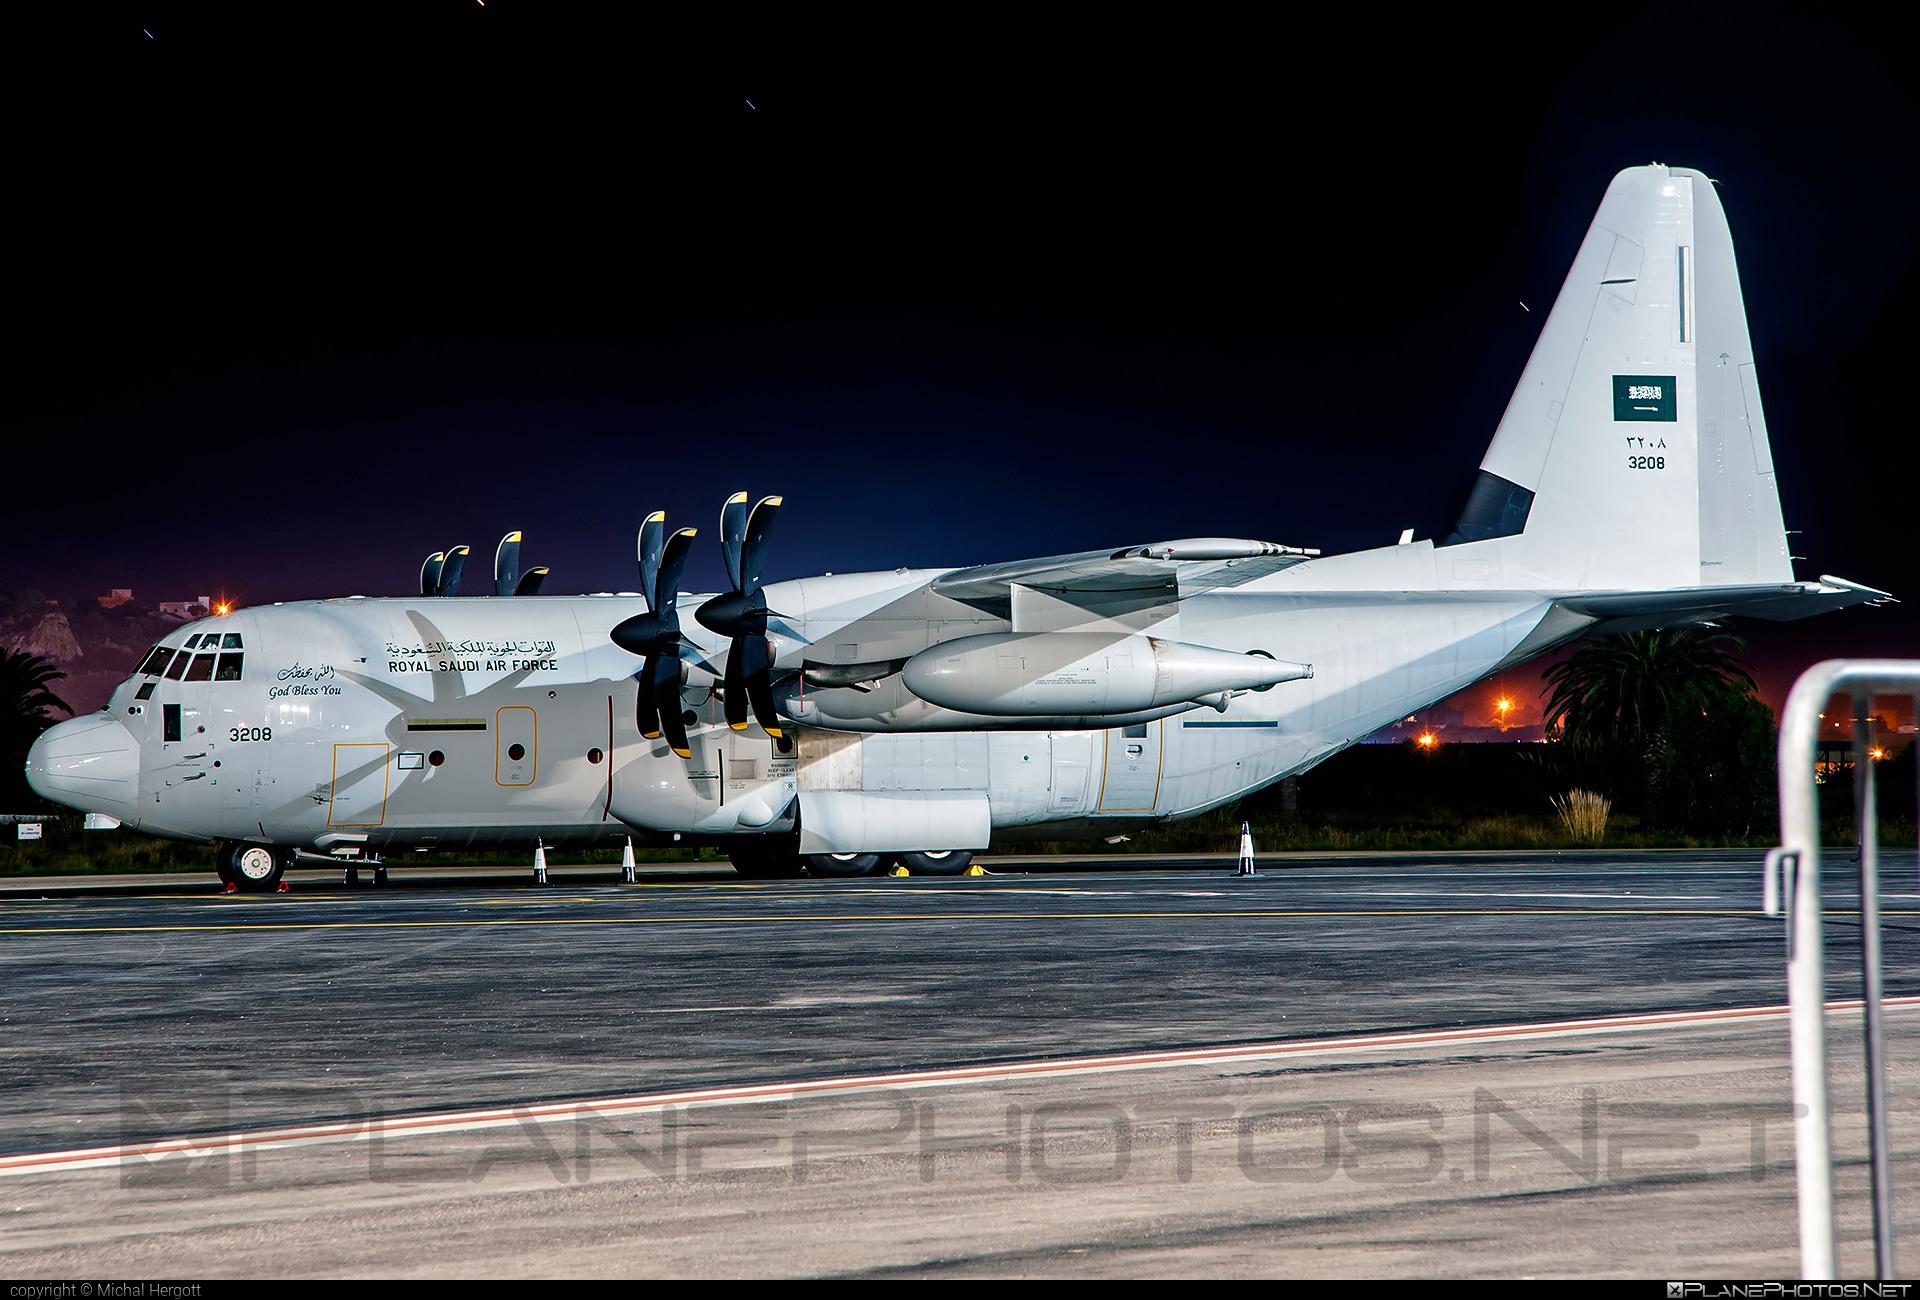 Lockheed Martin KC-130J Tanker - 3208 operated by Royal Saudi Air Force #c130 #c130j #kc130j #lockheedmartin